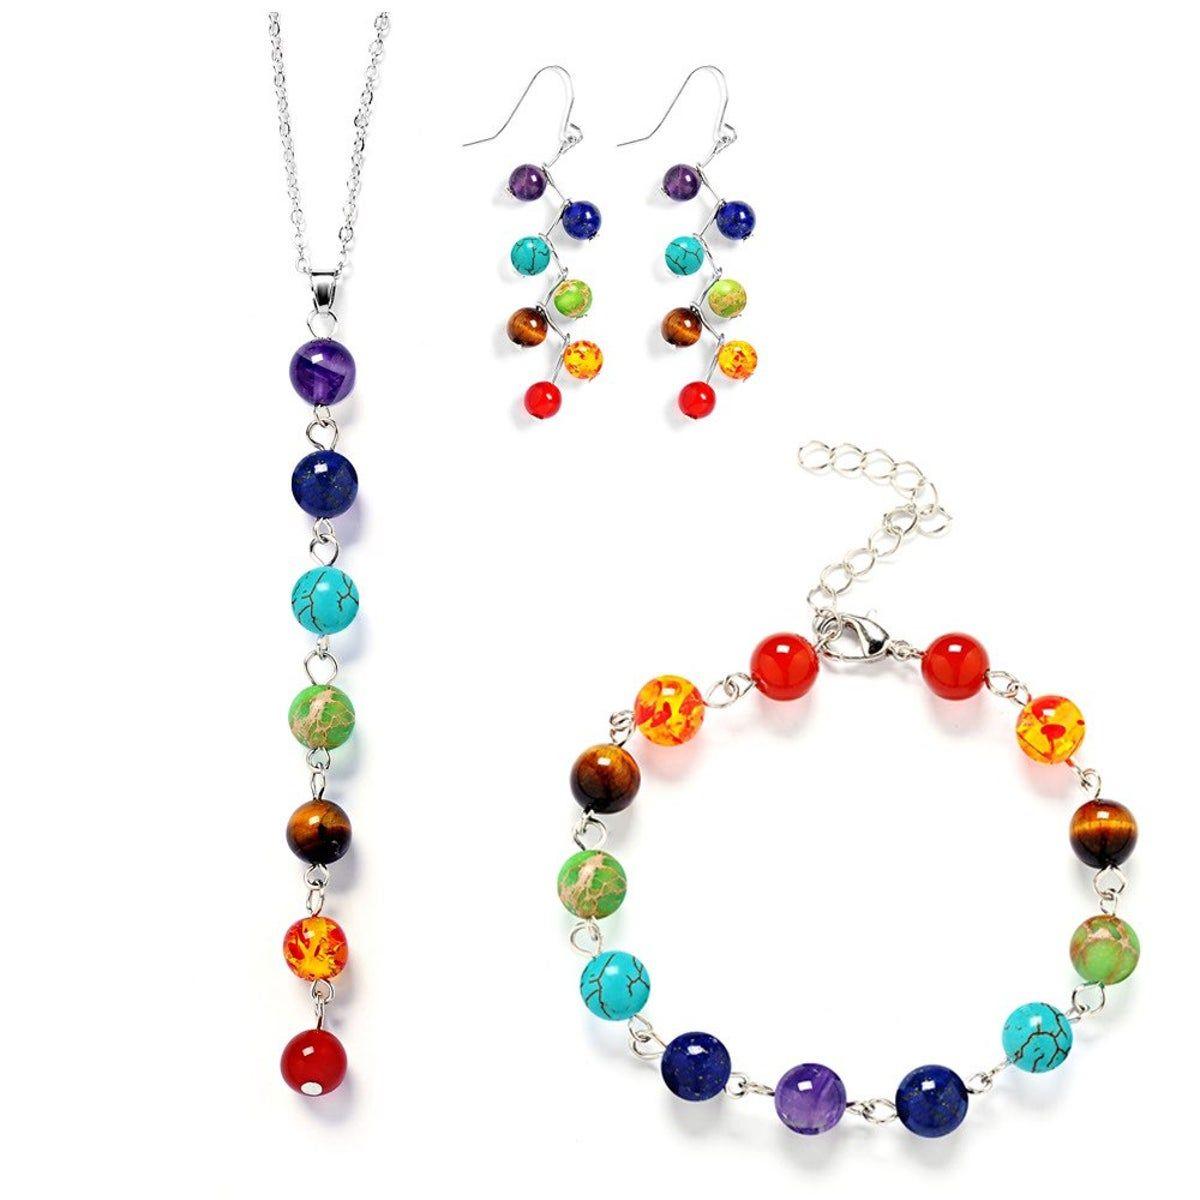 7 Chakra Quartz Stone Bead Pendant Necklace Healing Yoga Reiki Balancing Jewelry